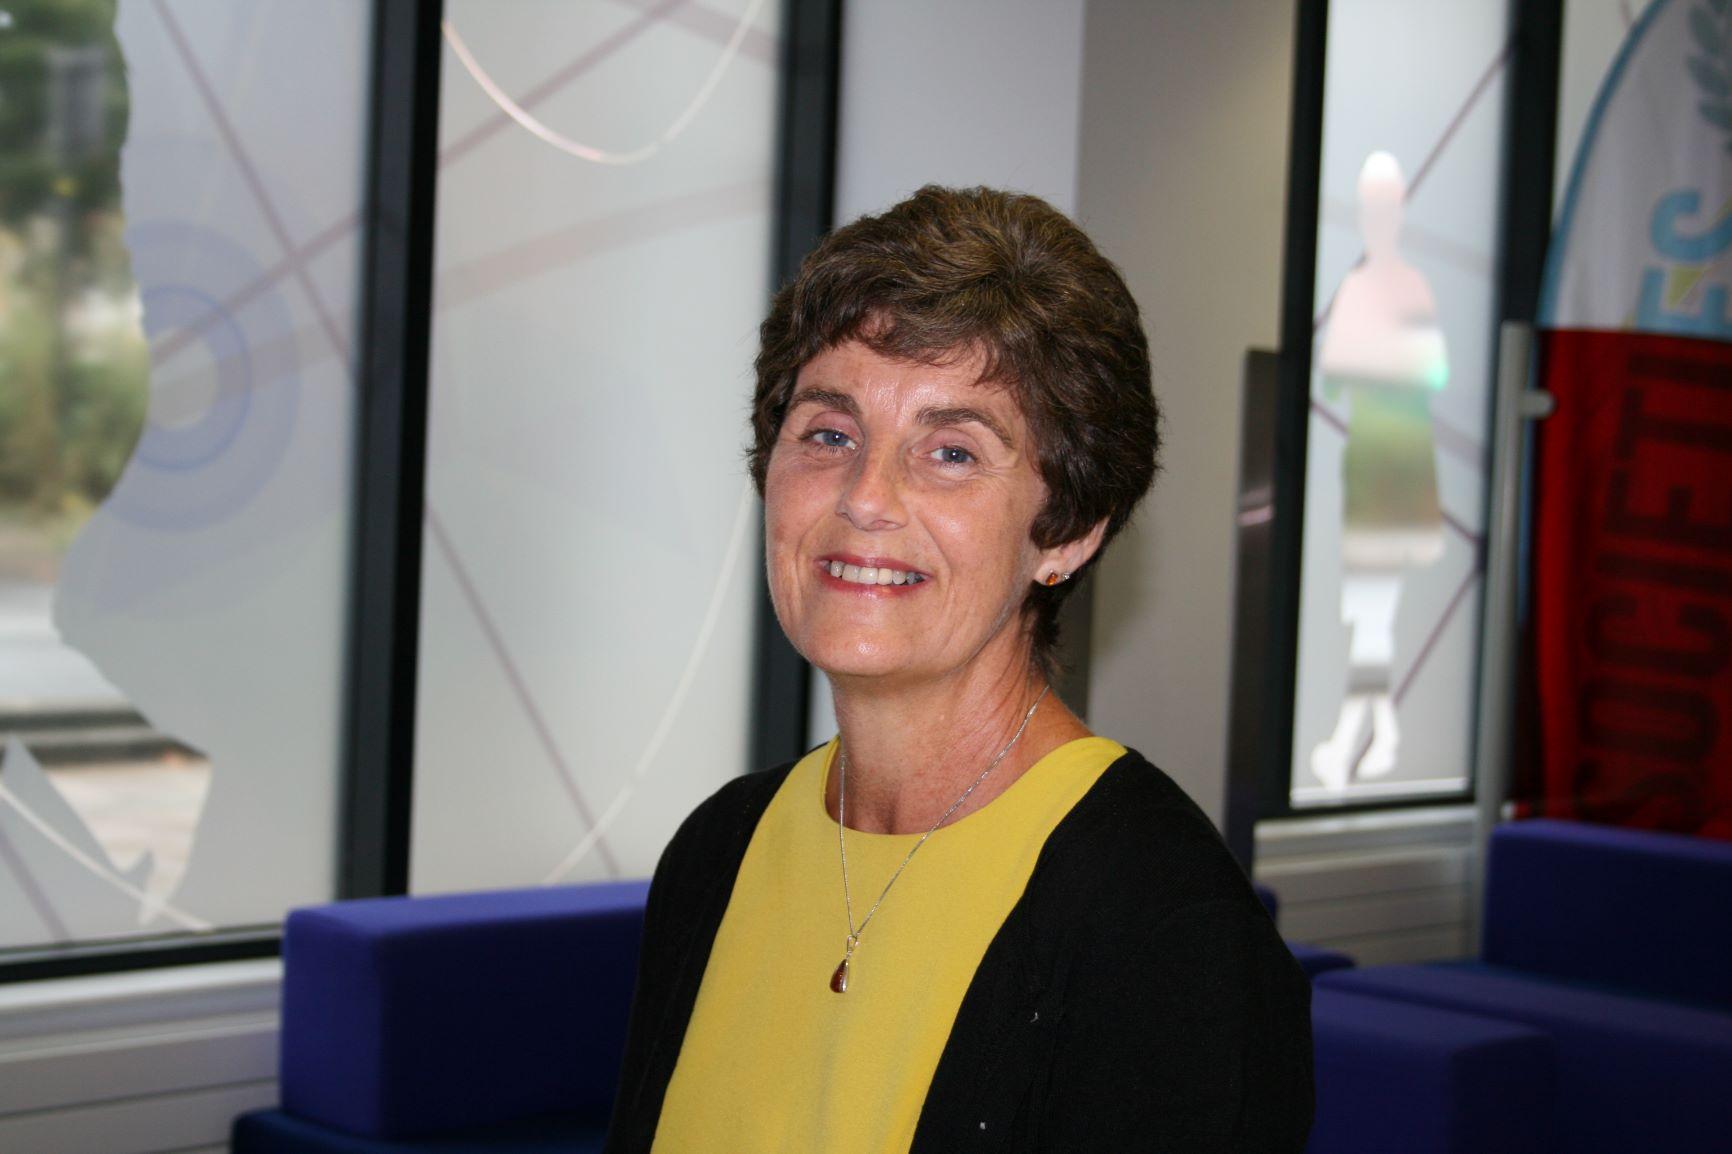 Professor Helen James on the STEM journey at Canterbury Christ Church University